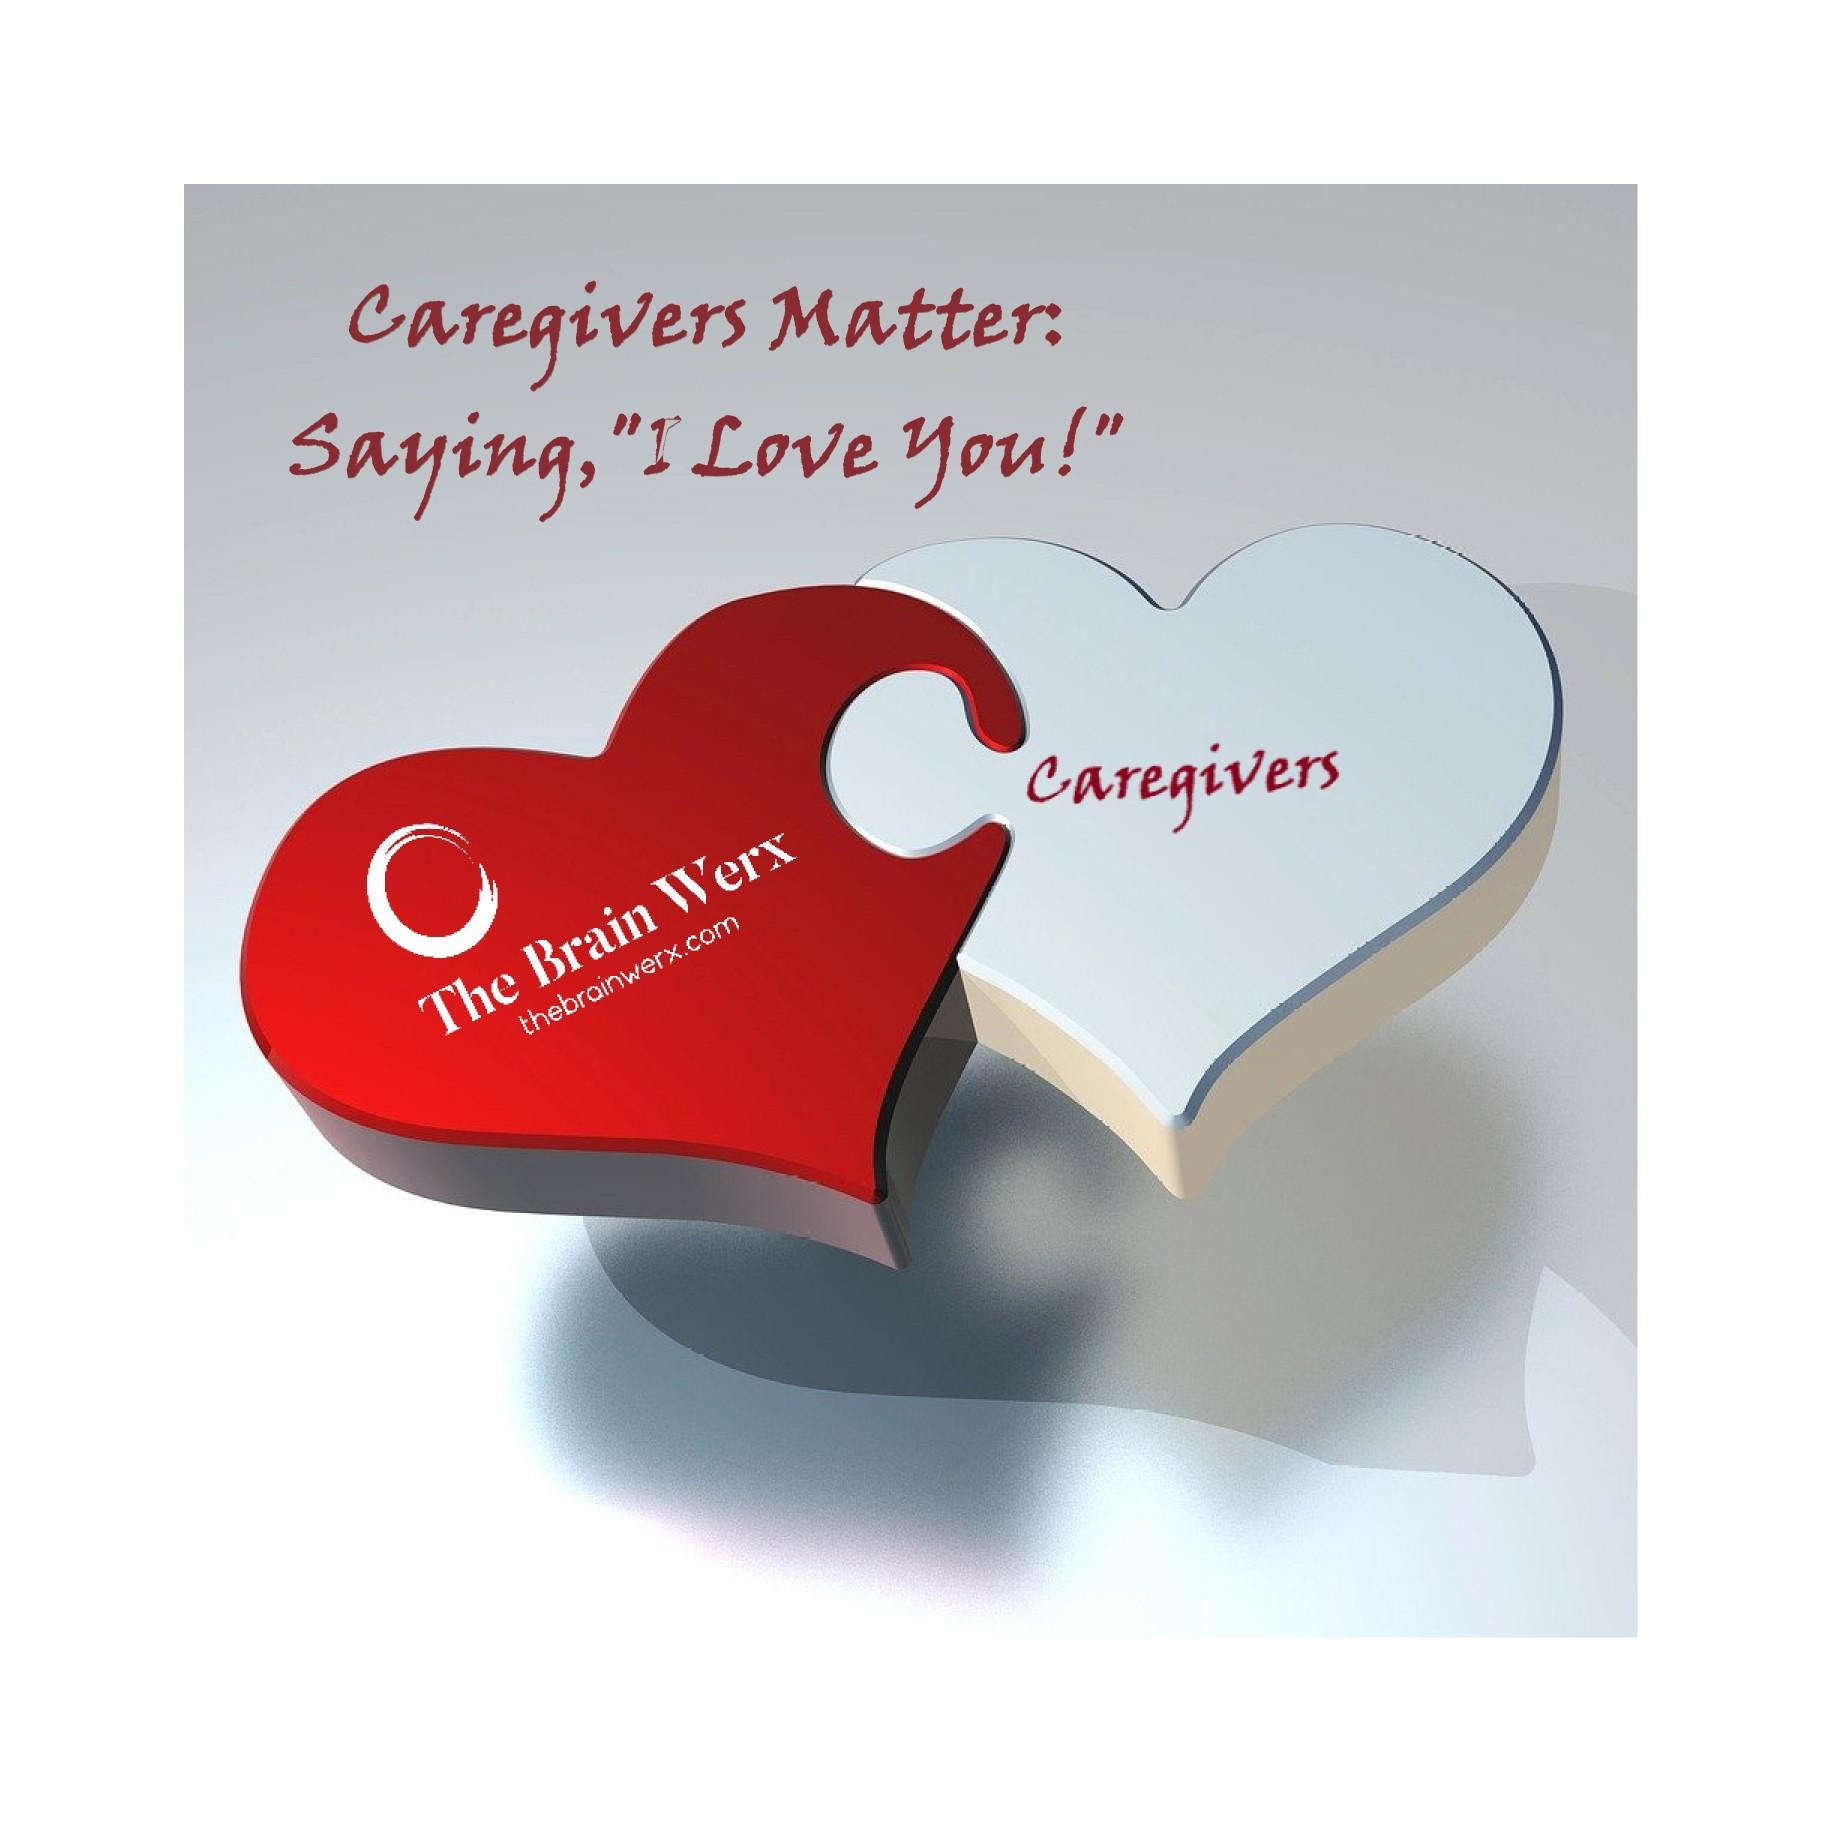 Caregivers Matter!